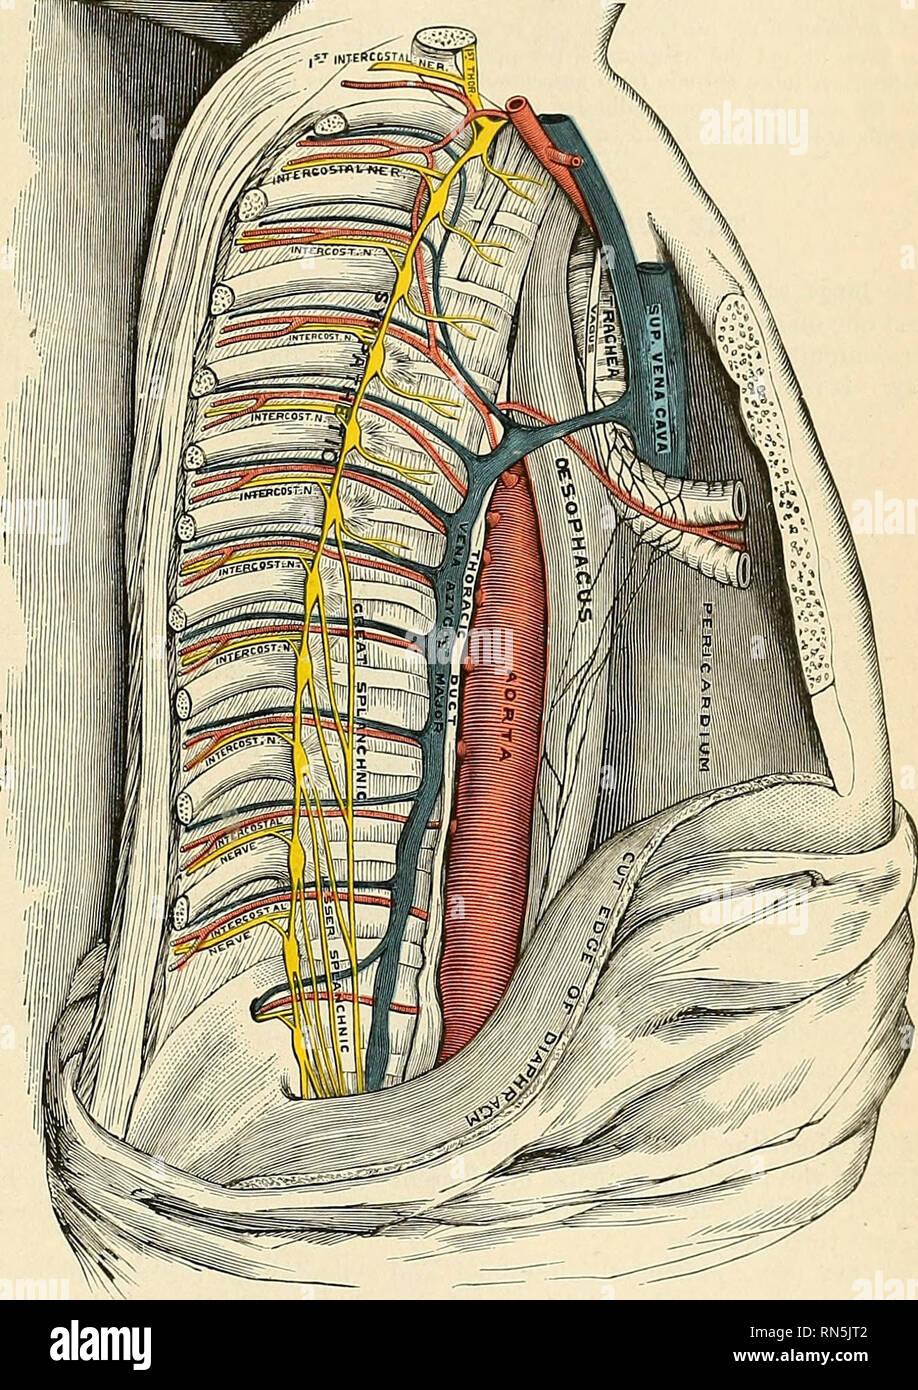 Mediastinal Lymph Nodes Chest Lym Jpg Galleryneed